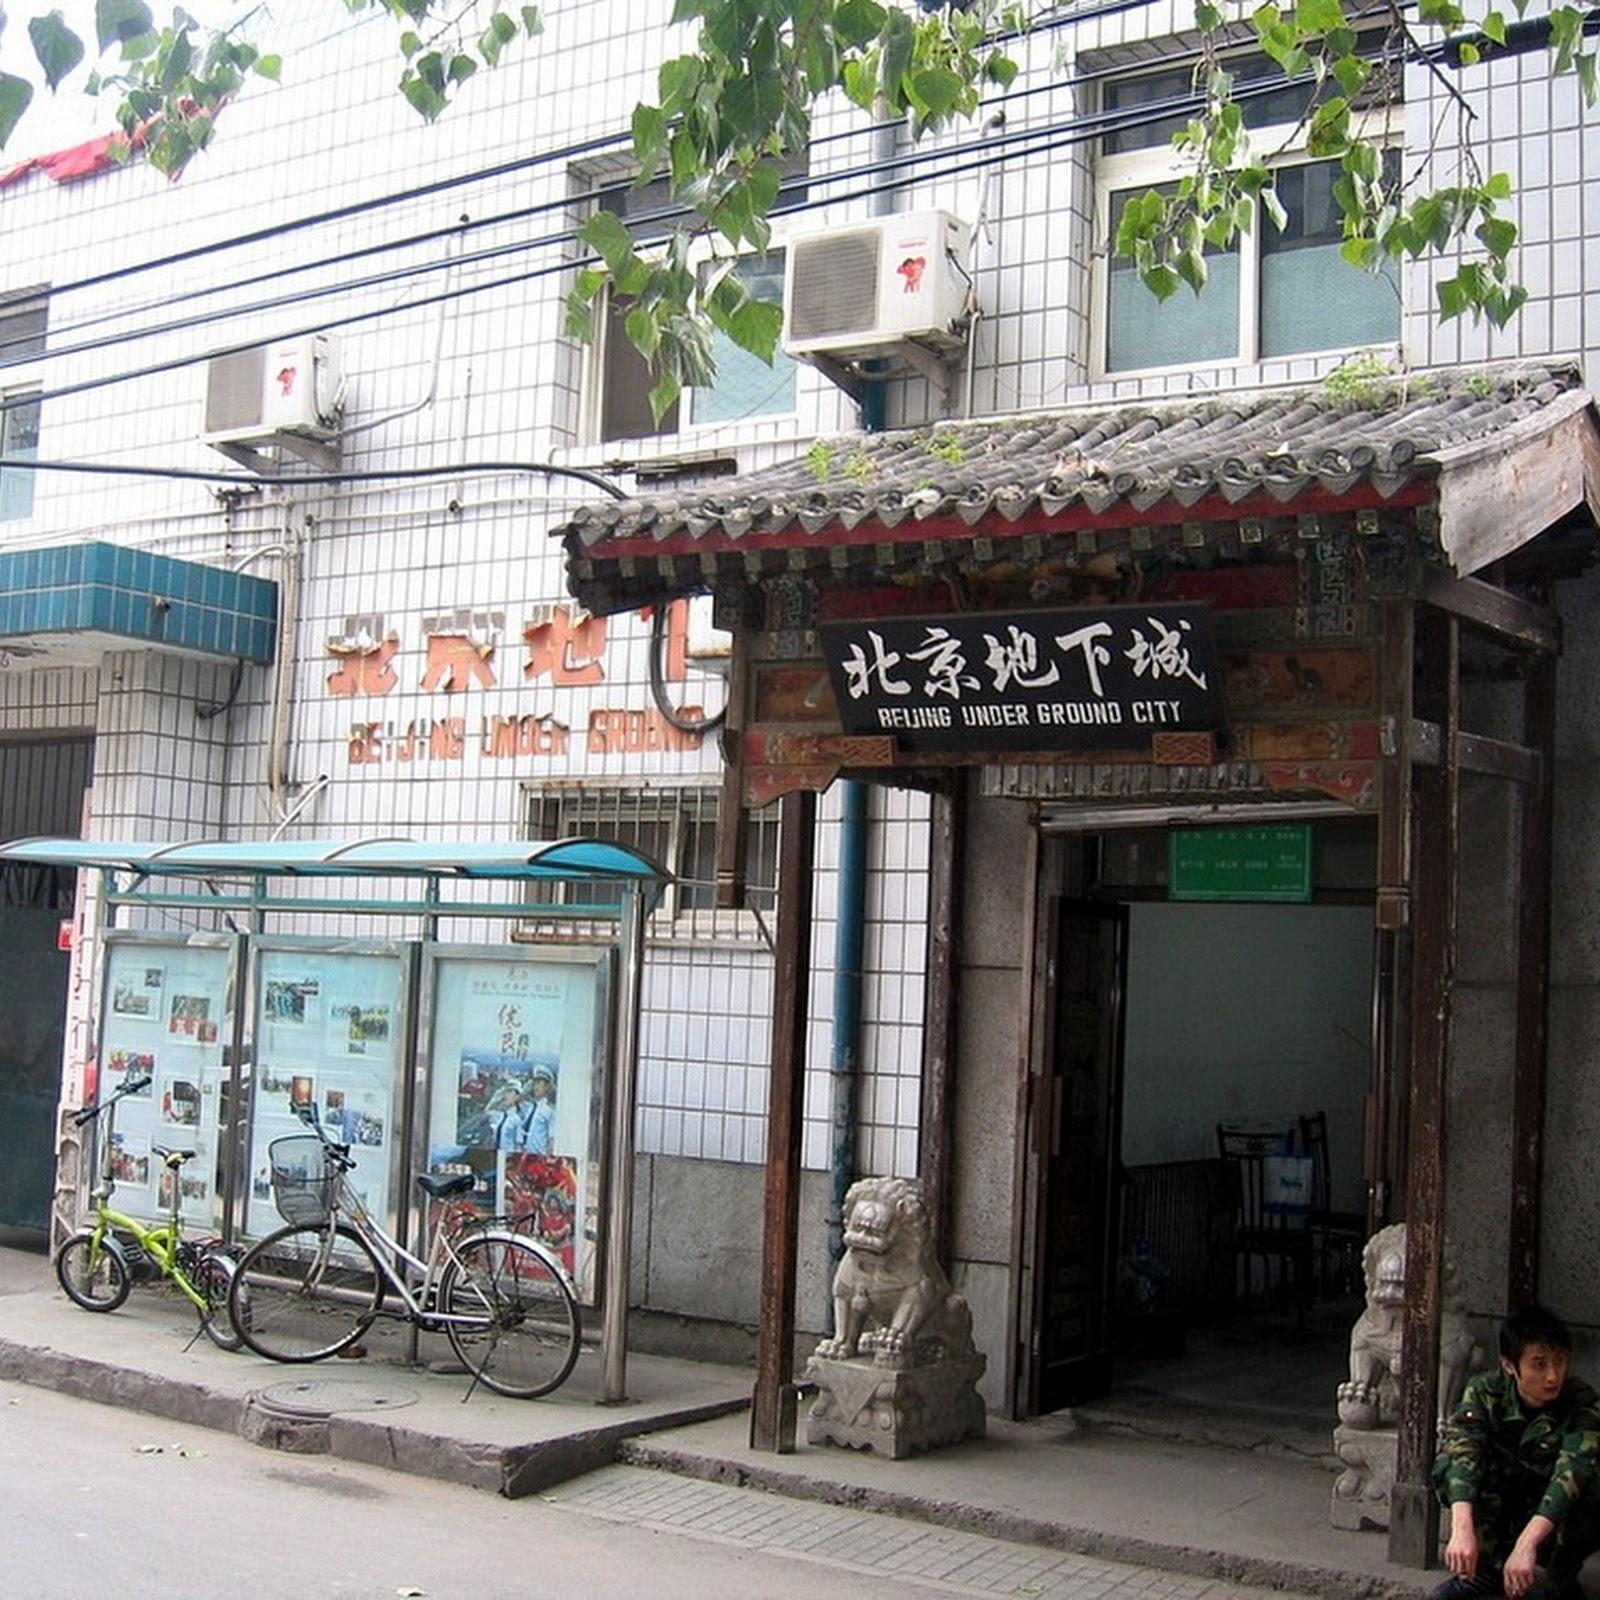 Beijing's Underground City